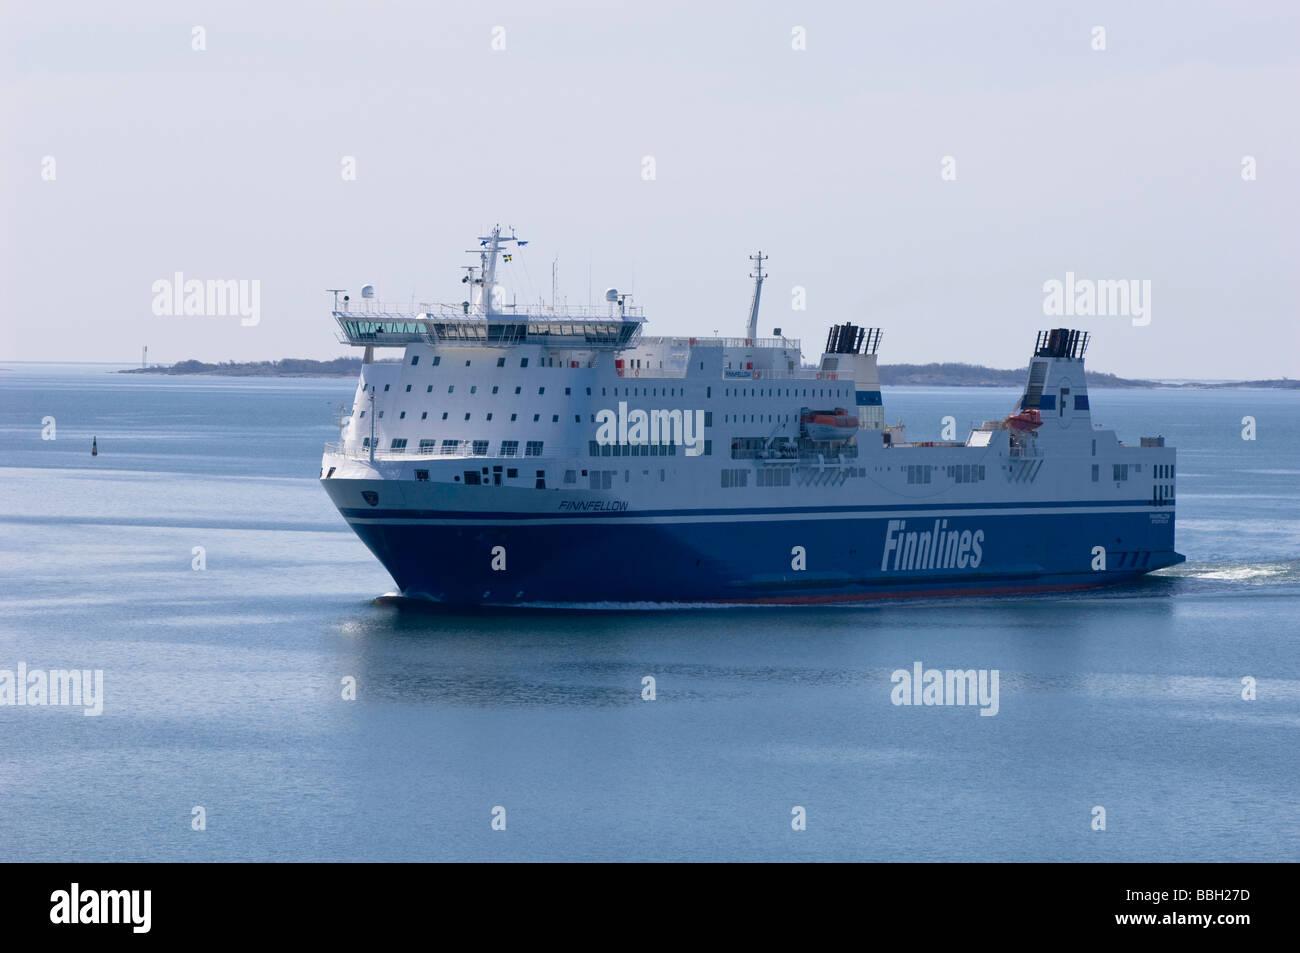 Finnlines ferry on way to Turku Baltic Sea Finland - Stock Image